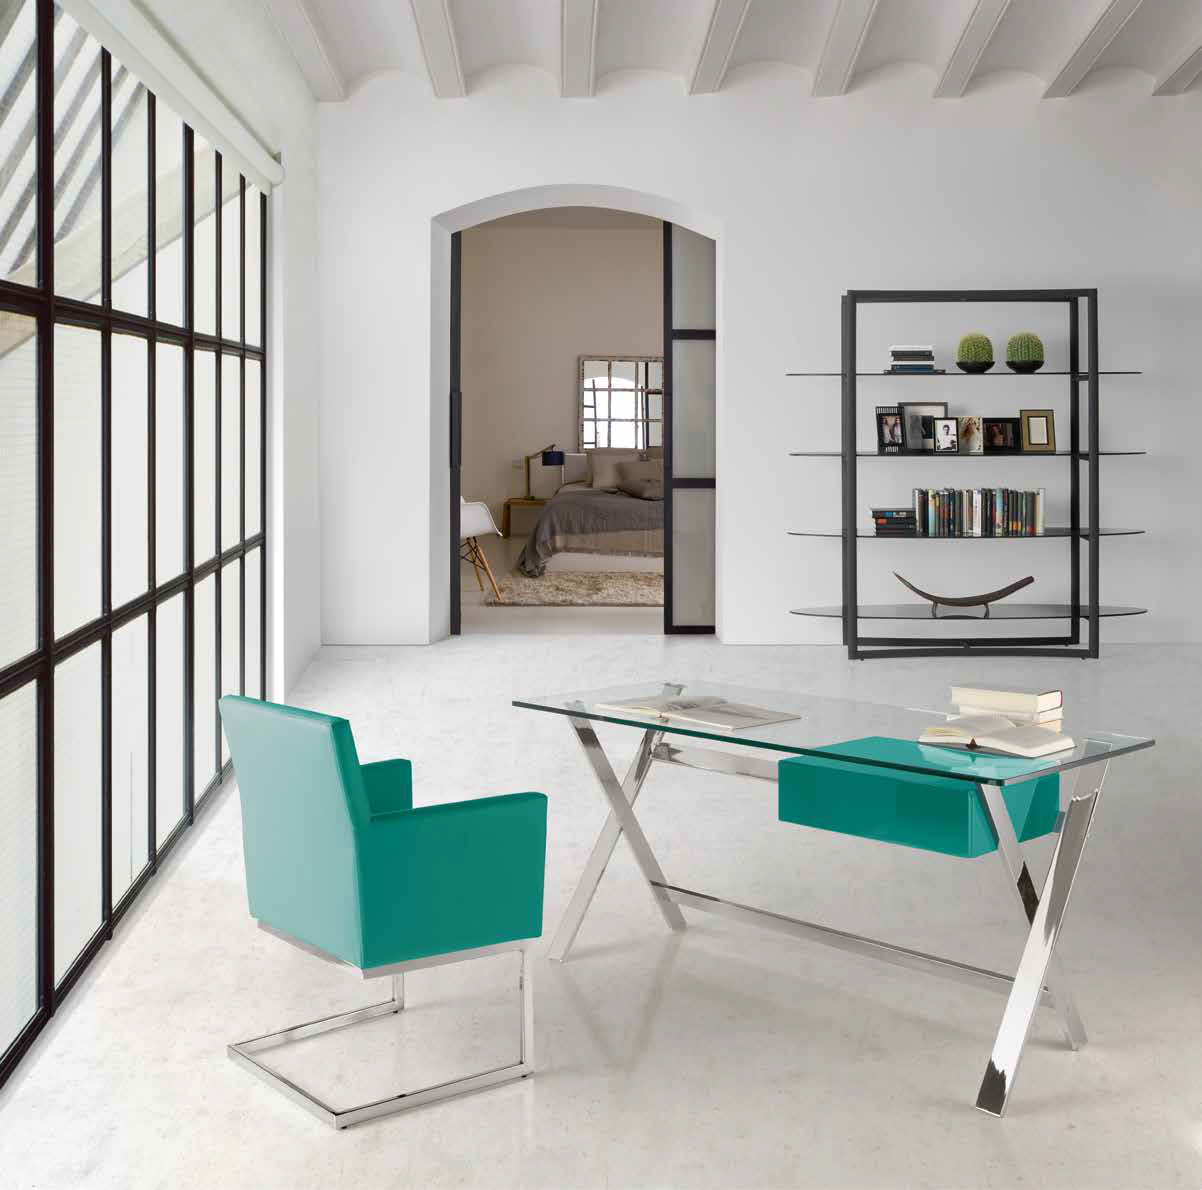 Mesa Despacho Diseño Zacatecas. - Muebles DíazMuebles Díaz